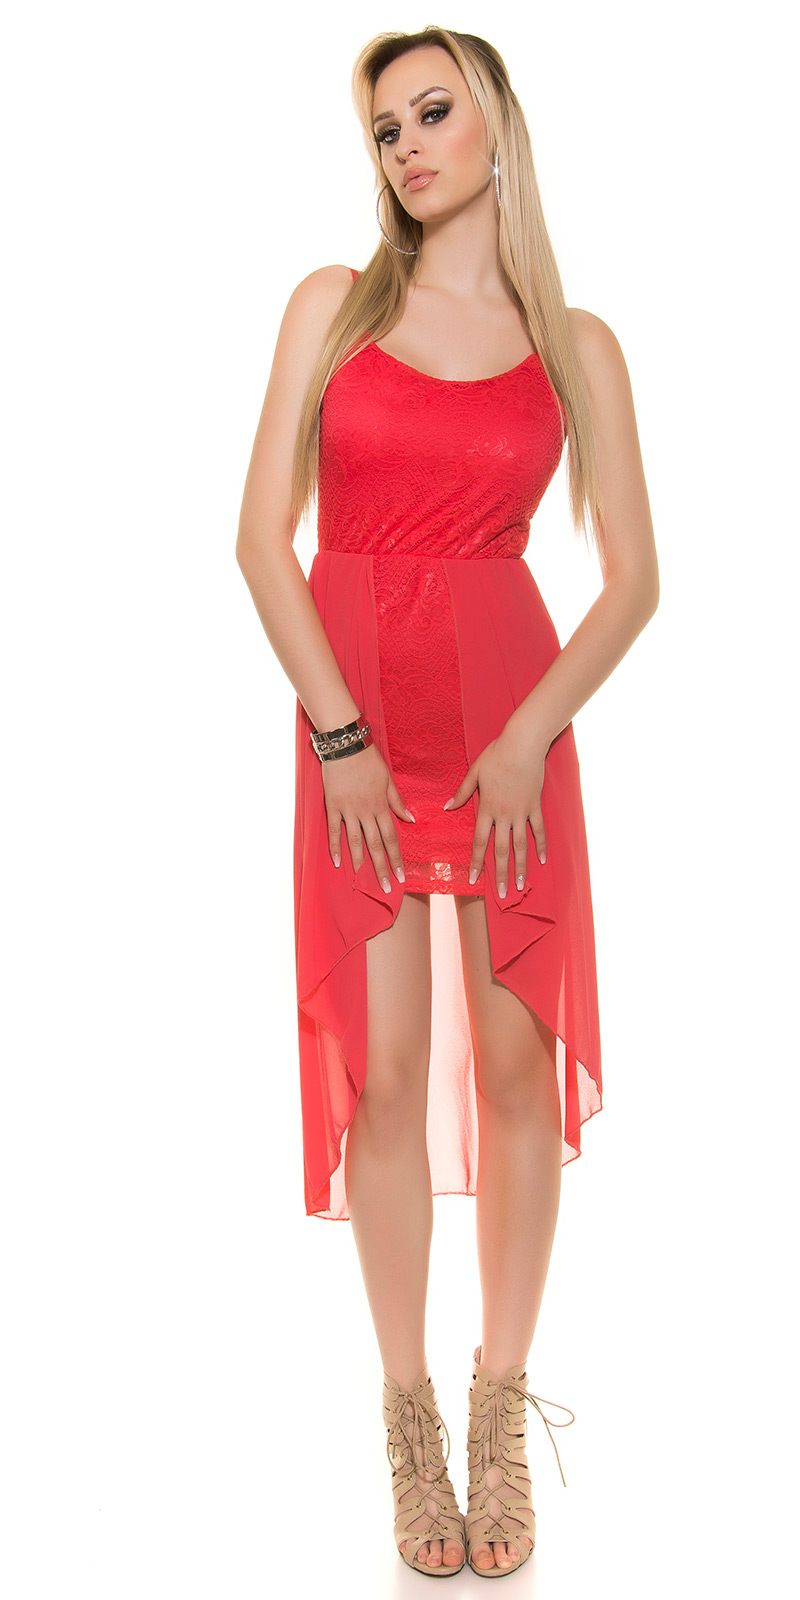 koucla highlow kleid spitze chiffon abendkleid vokuhila minikleid hochzeit rot ebay. Black Bedroom Furniture Sets. Home Design Ideas